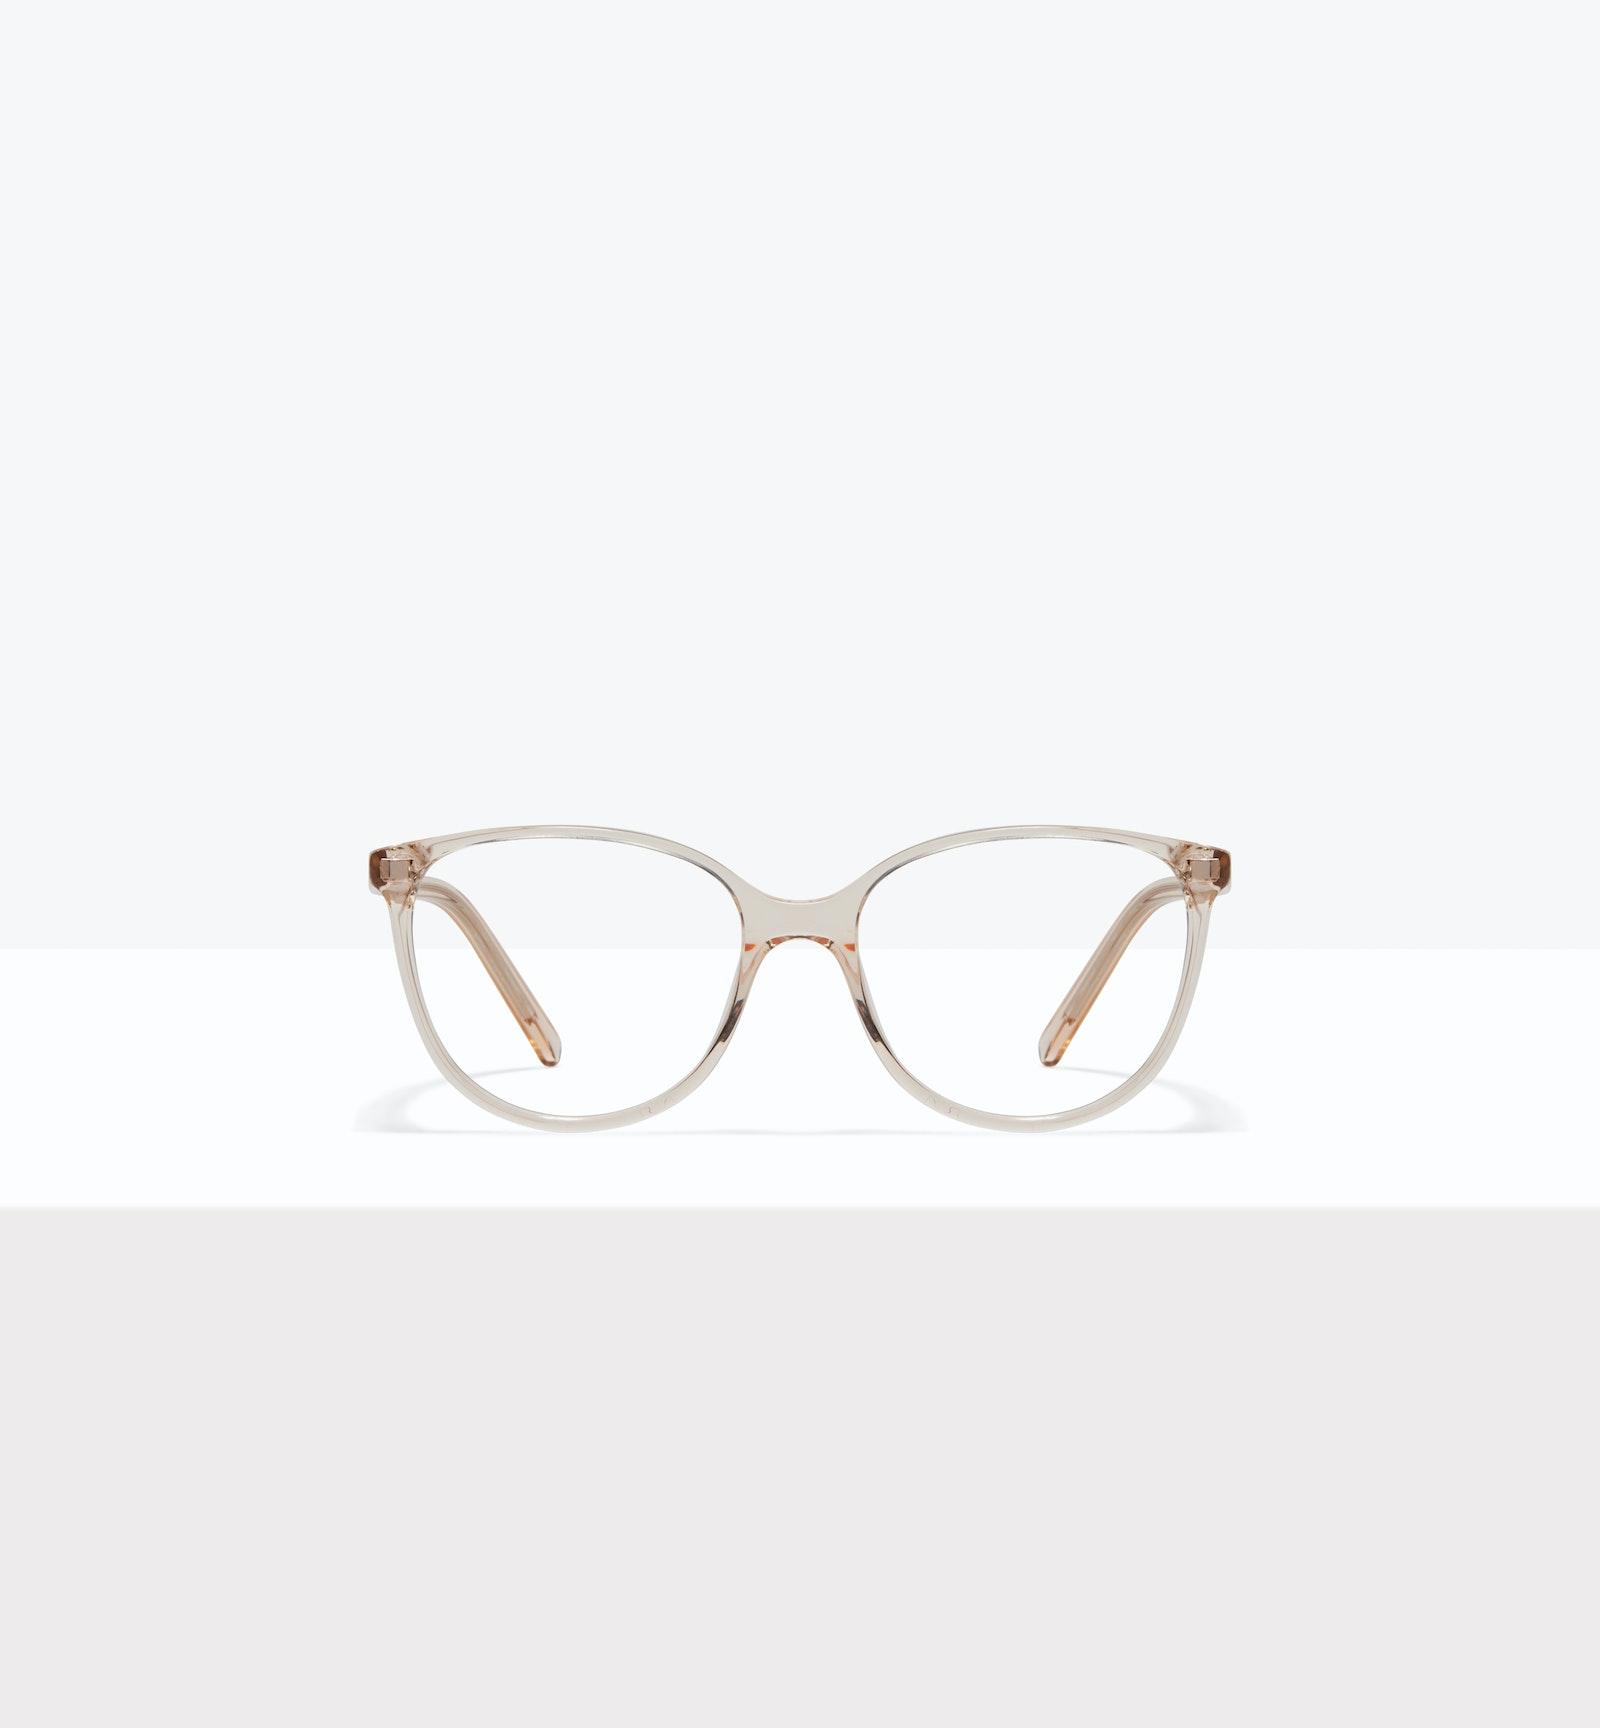 Affordable Fashion Glasses Cat Eye Eyeglasses Women Imagine XL Blond